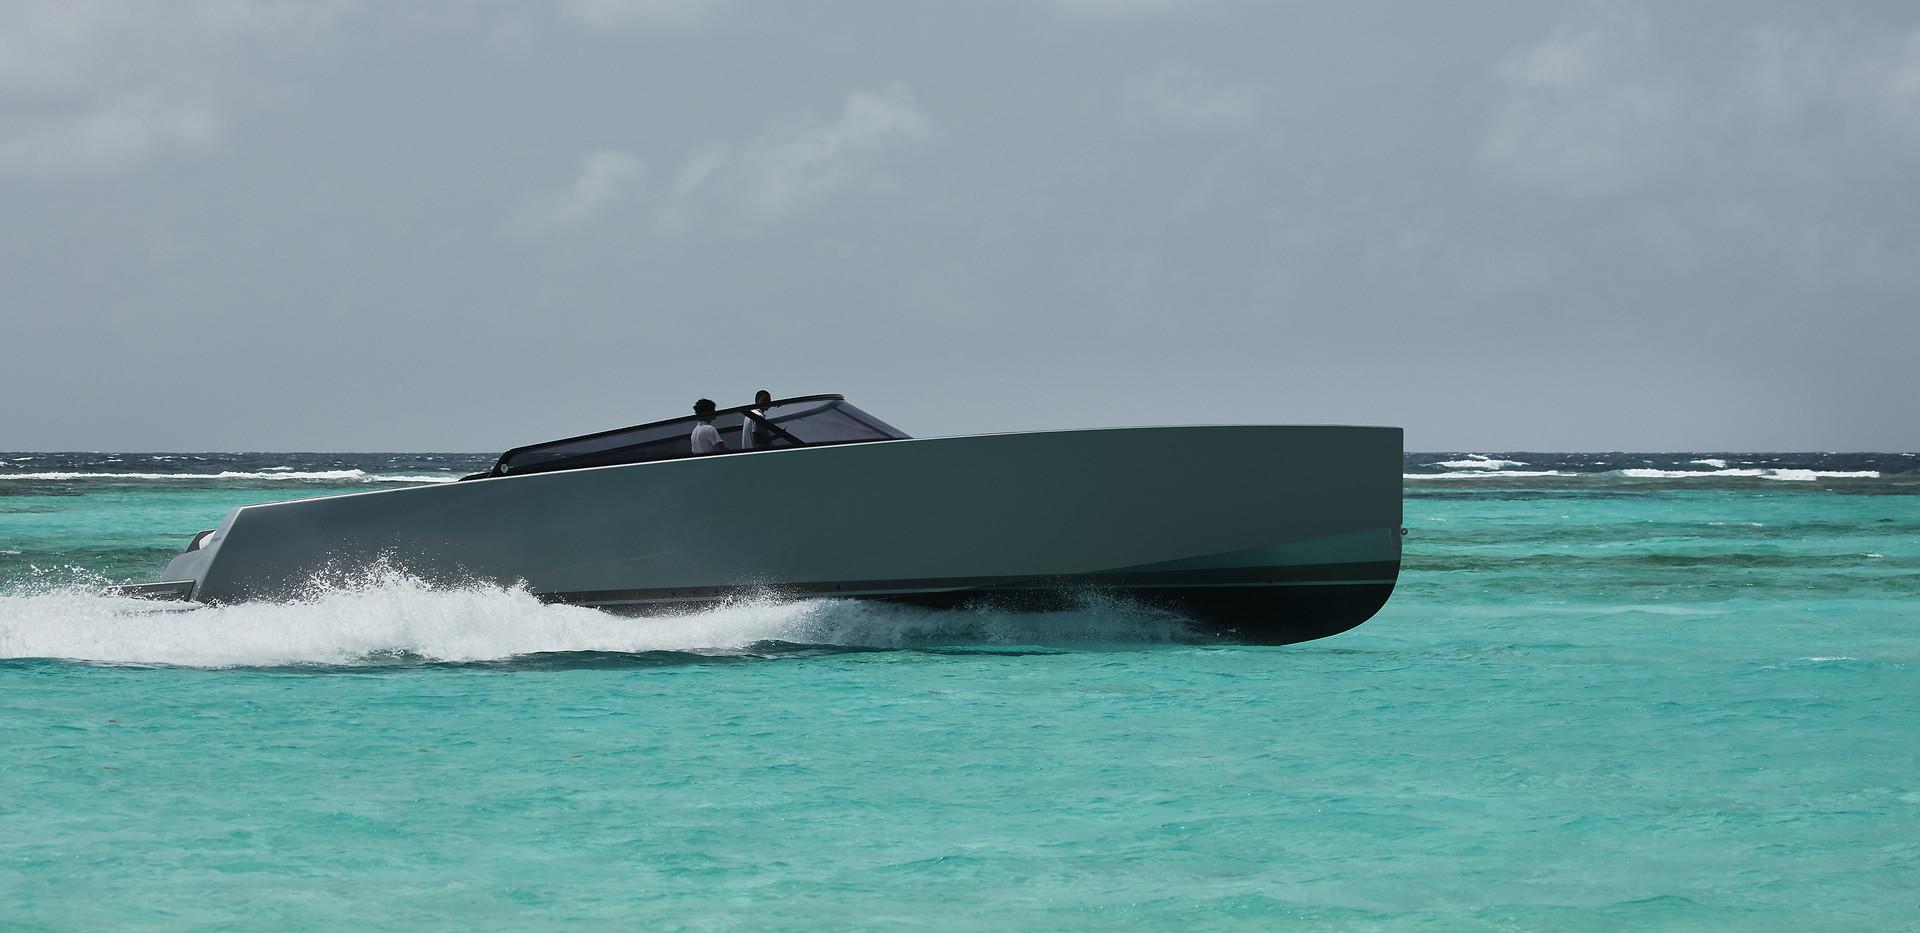 canouan-hotel-leisure-luxury-yacht-02.jp